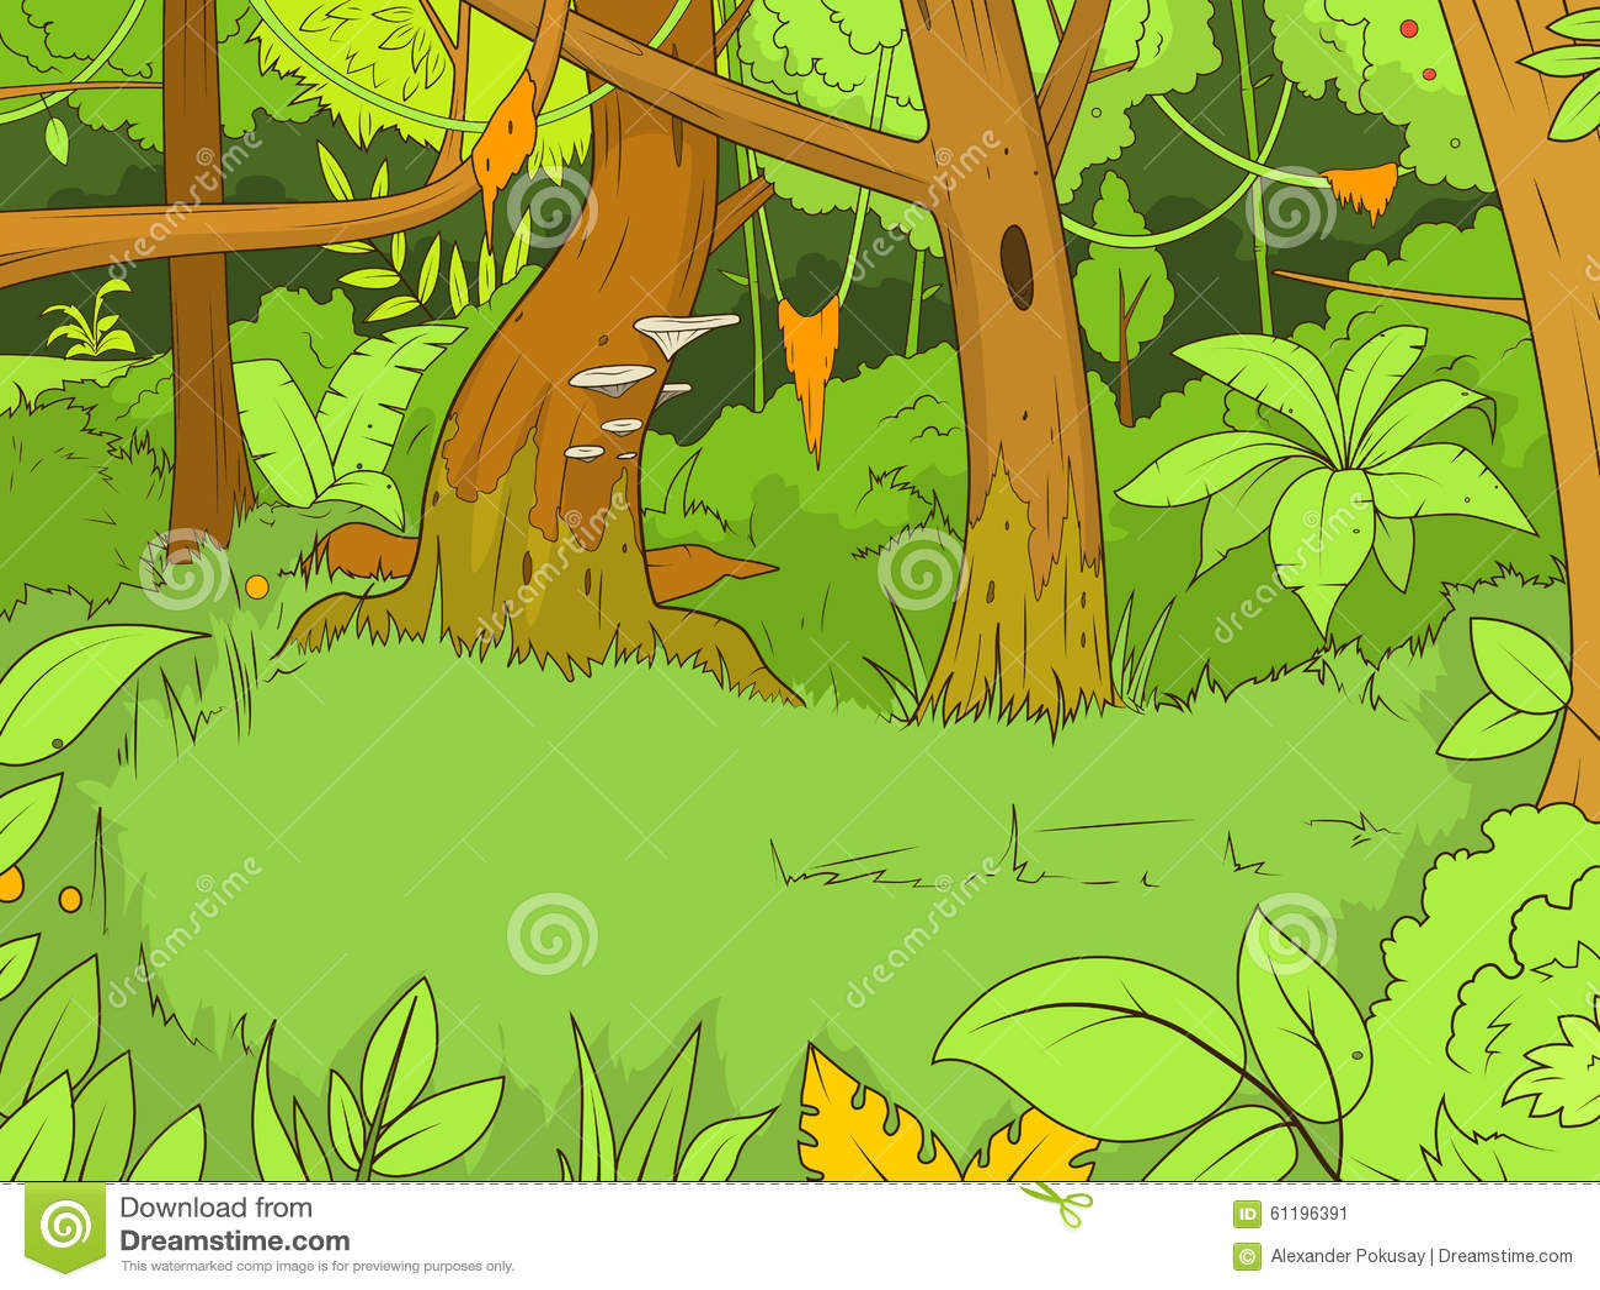 Jungle Forest Cartoon Vector Illustration Stock Vector ...